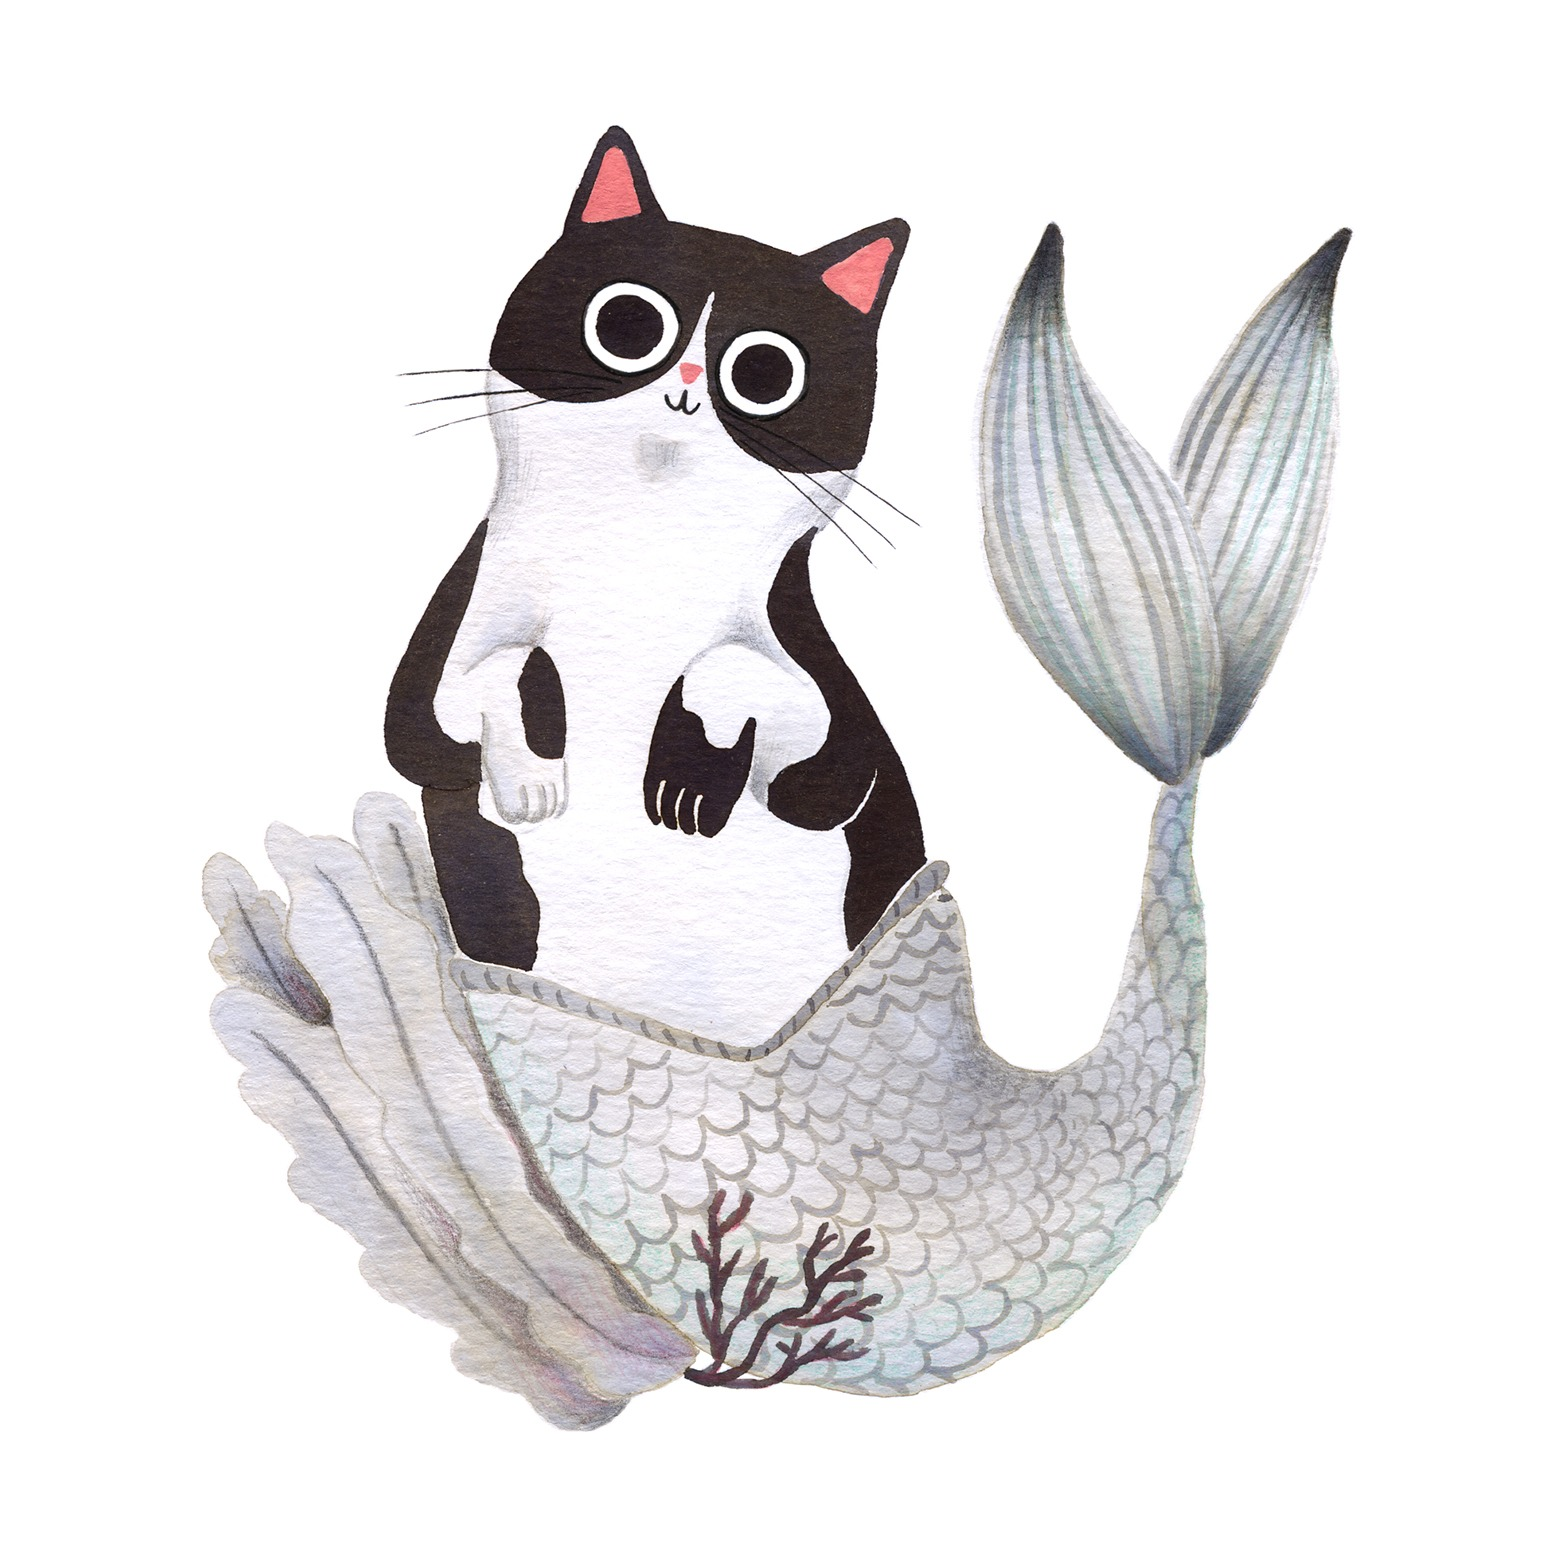 Ilustración de gato, Inktober, gato-sirena, retrato de gato